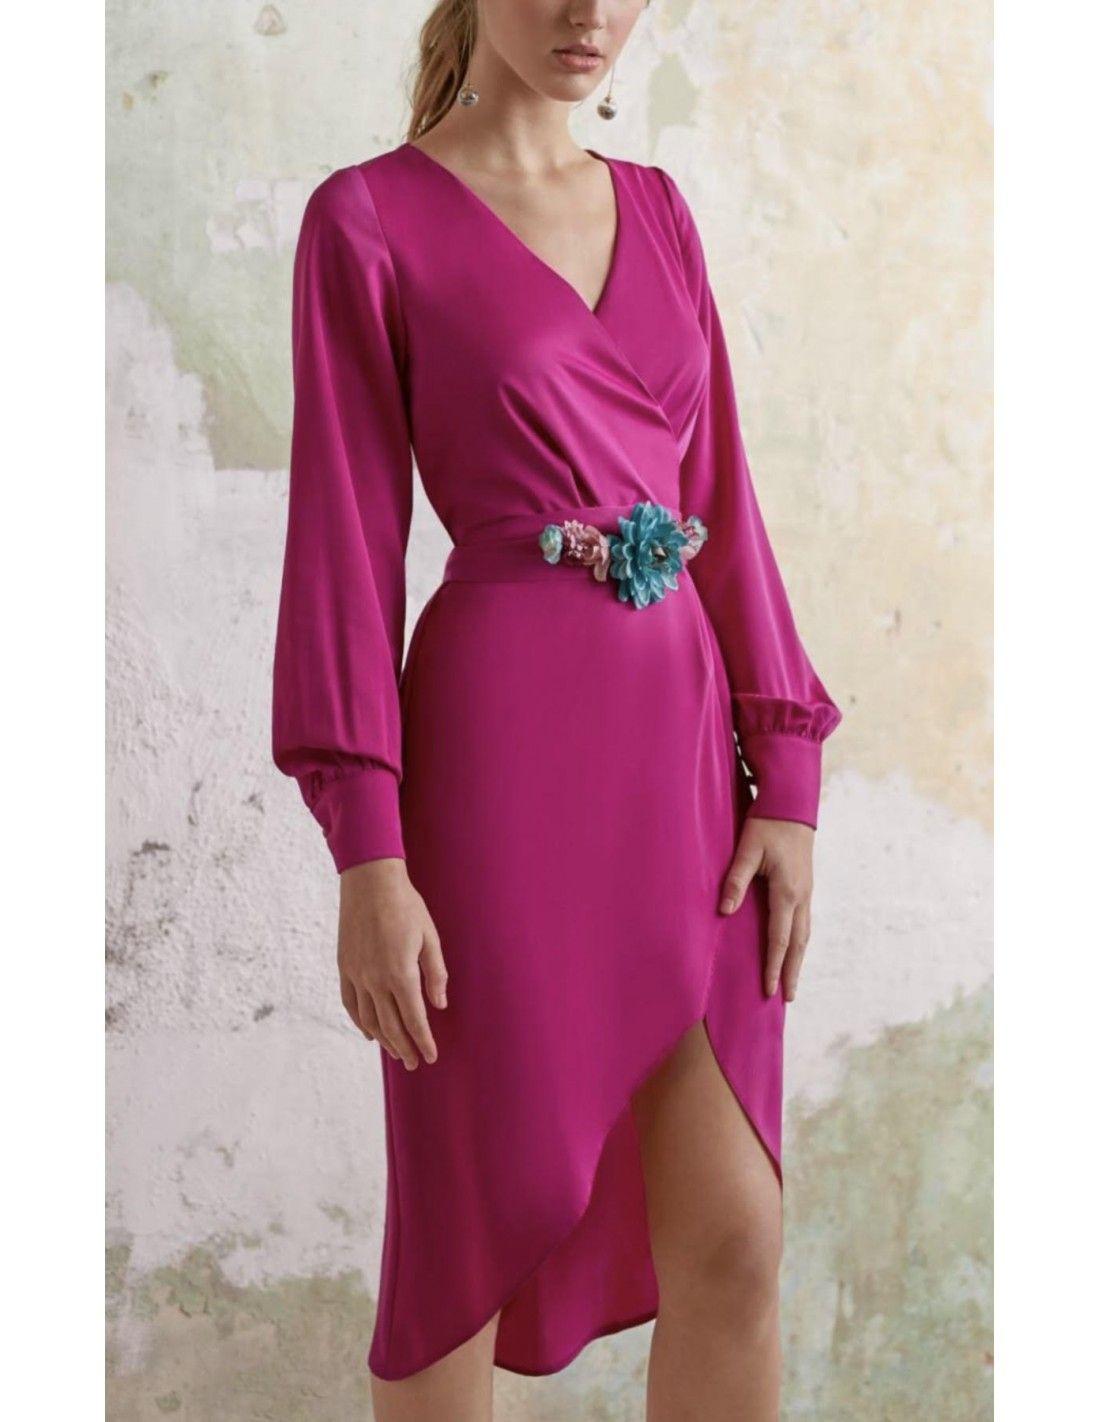 Vestido Desa - Vestido en color buganvilla. Escote cruzado. Manga larga con  terminación en e96ffe64f08b